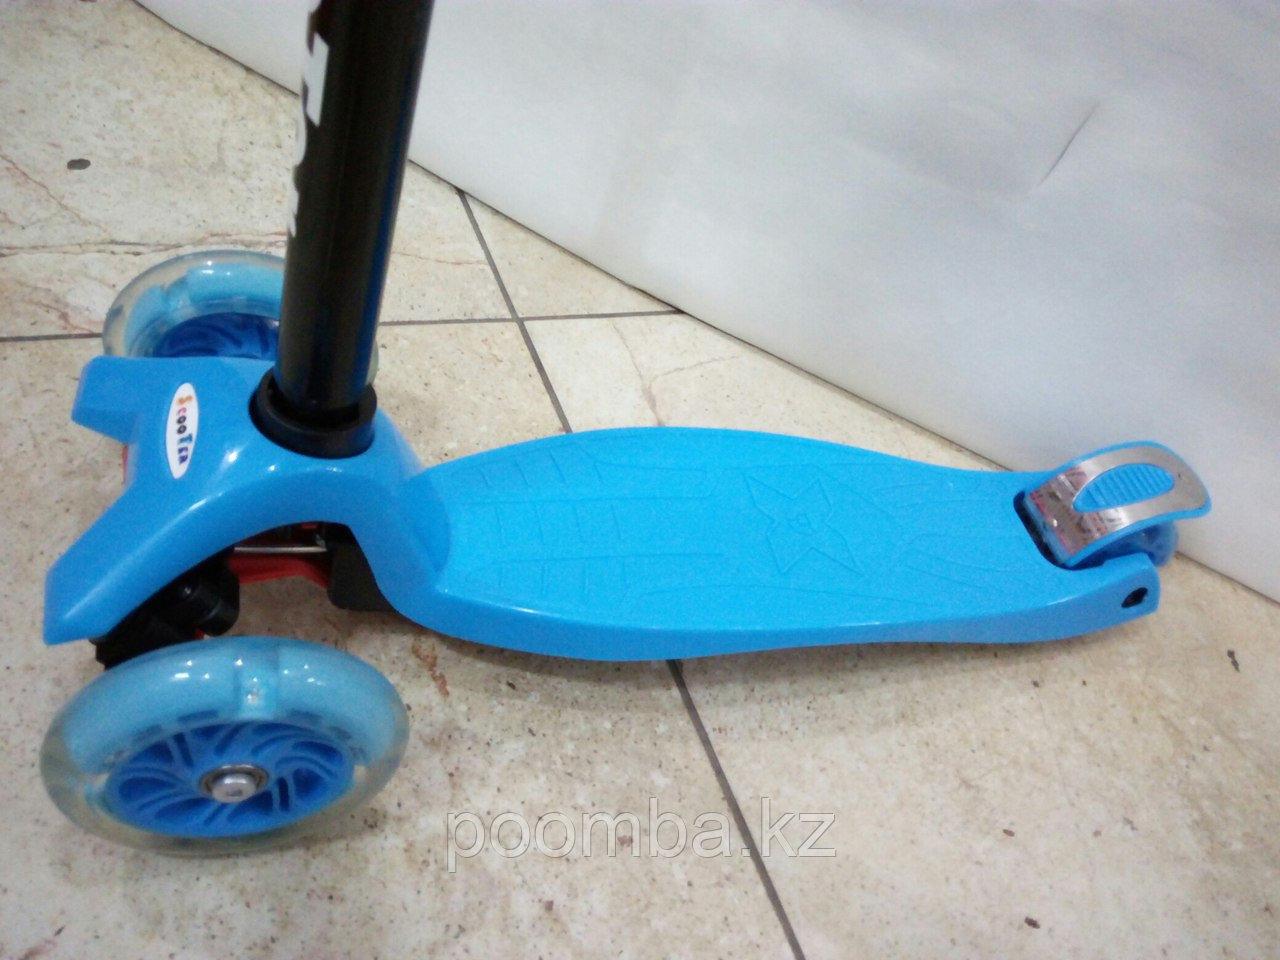 Трехколесный самокат от 4х лет (синий)